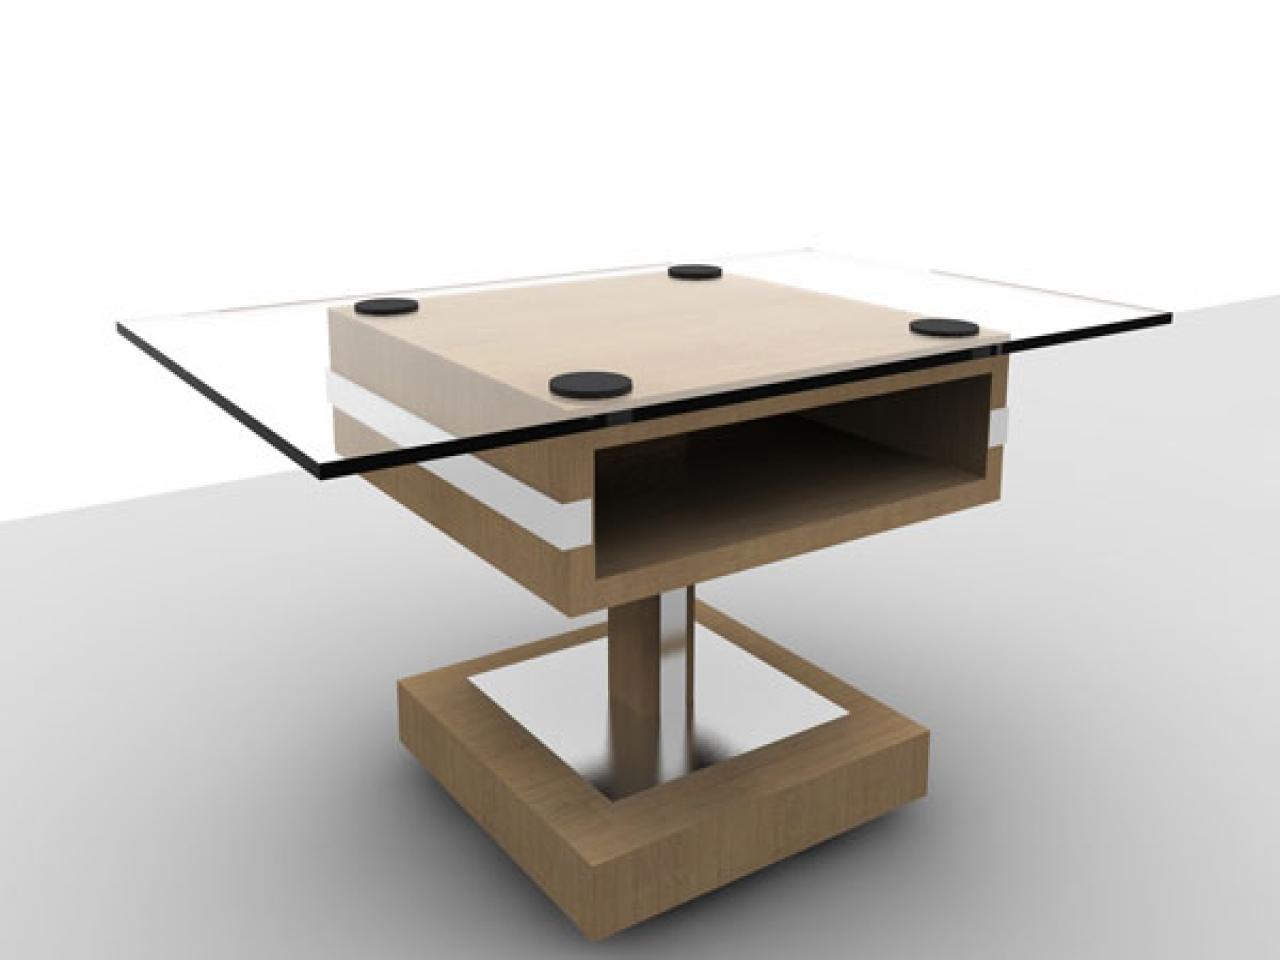 coffee table cool design photo - 3